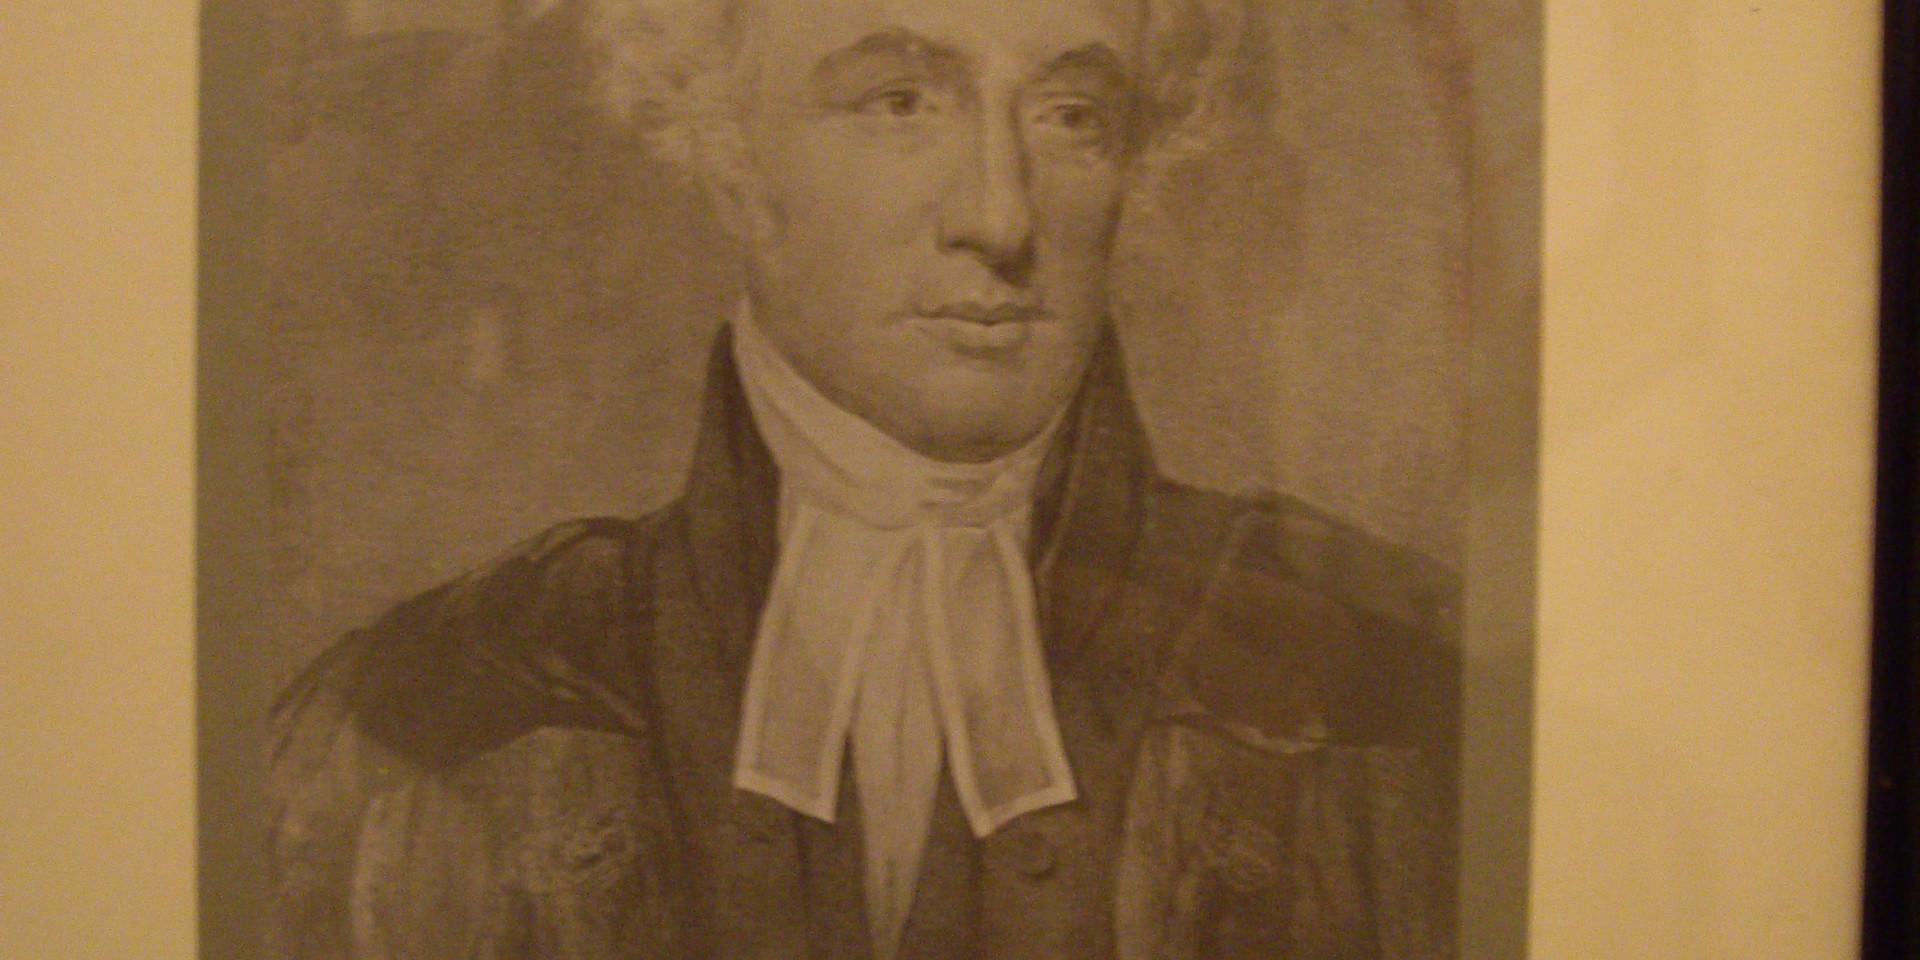 Rev. Dr. Norman MacLeod 1835 - 1862